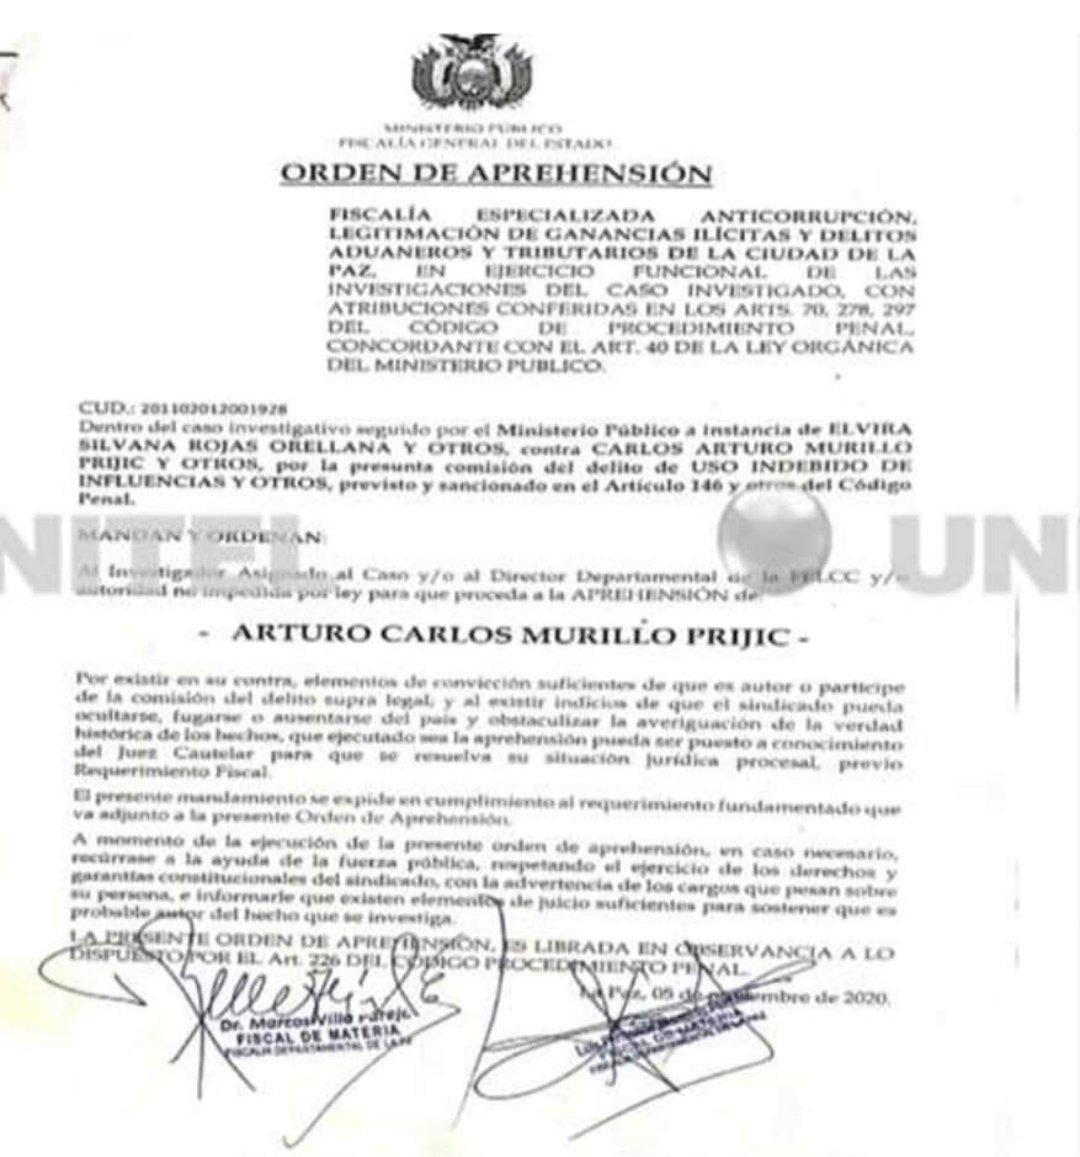 2019 Bolivian political crisis - Page 4 Em_TlcQW8Ach2LE?format=jpg&name=medium